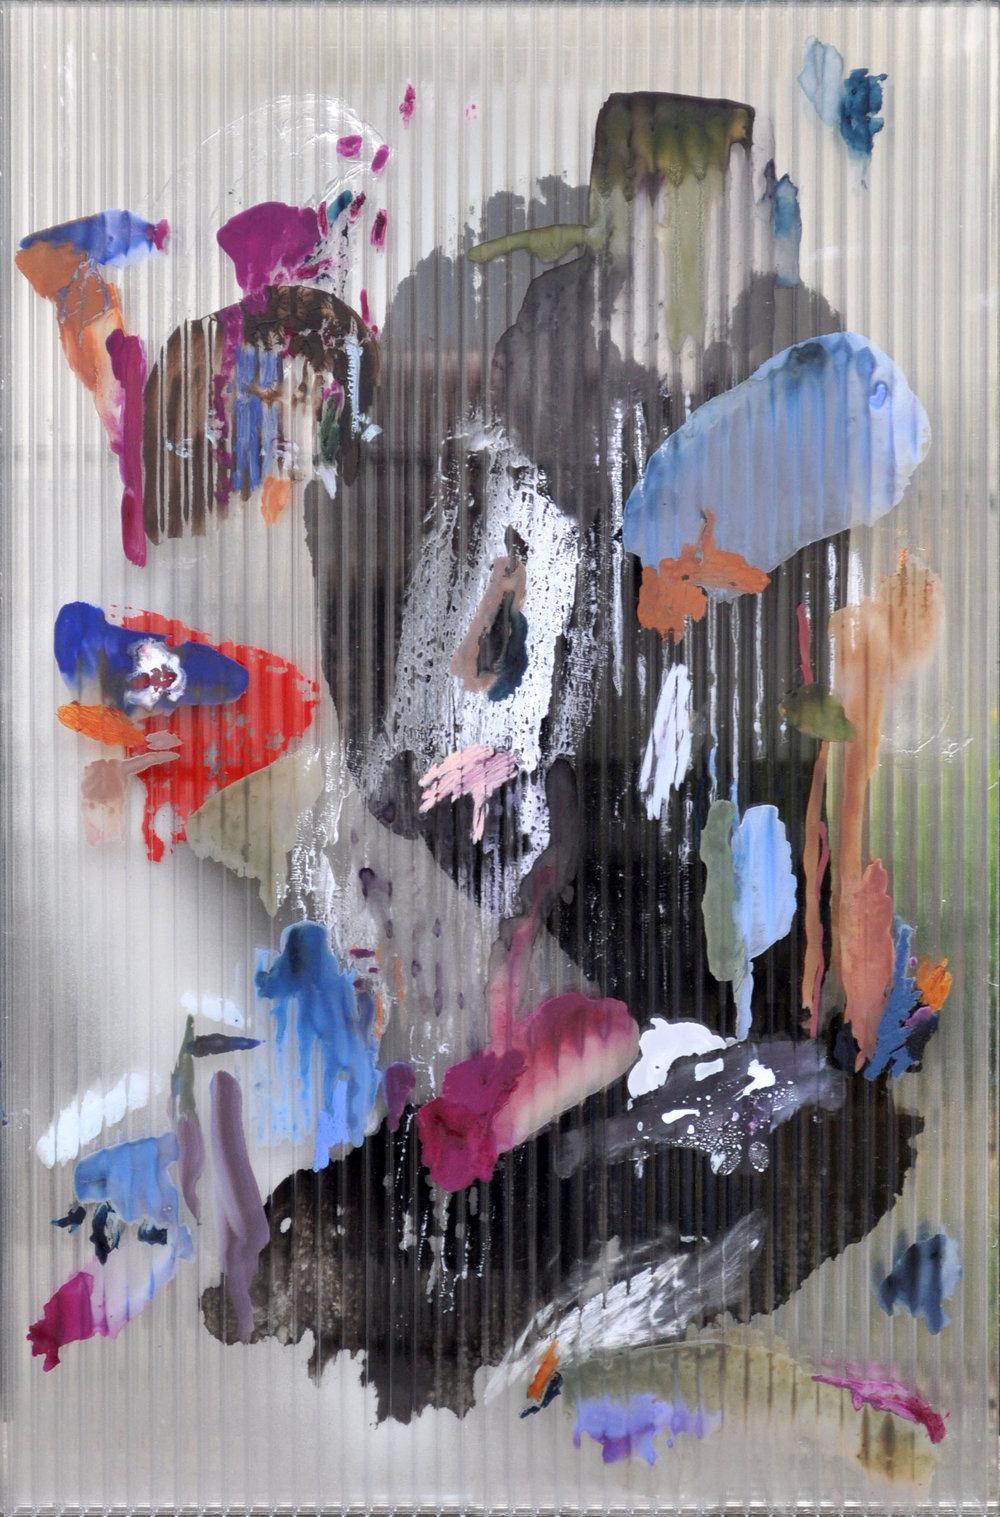 Chaos 1 , 2017 gouache, ink, acrylic, oil, mastic on polycarbonate, mirror, aluminium frame 67 x 44,5 x 2,5 cm